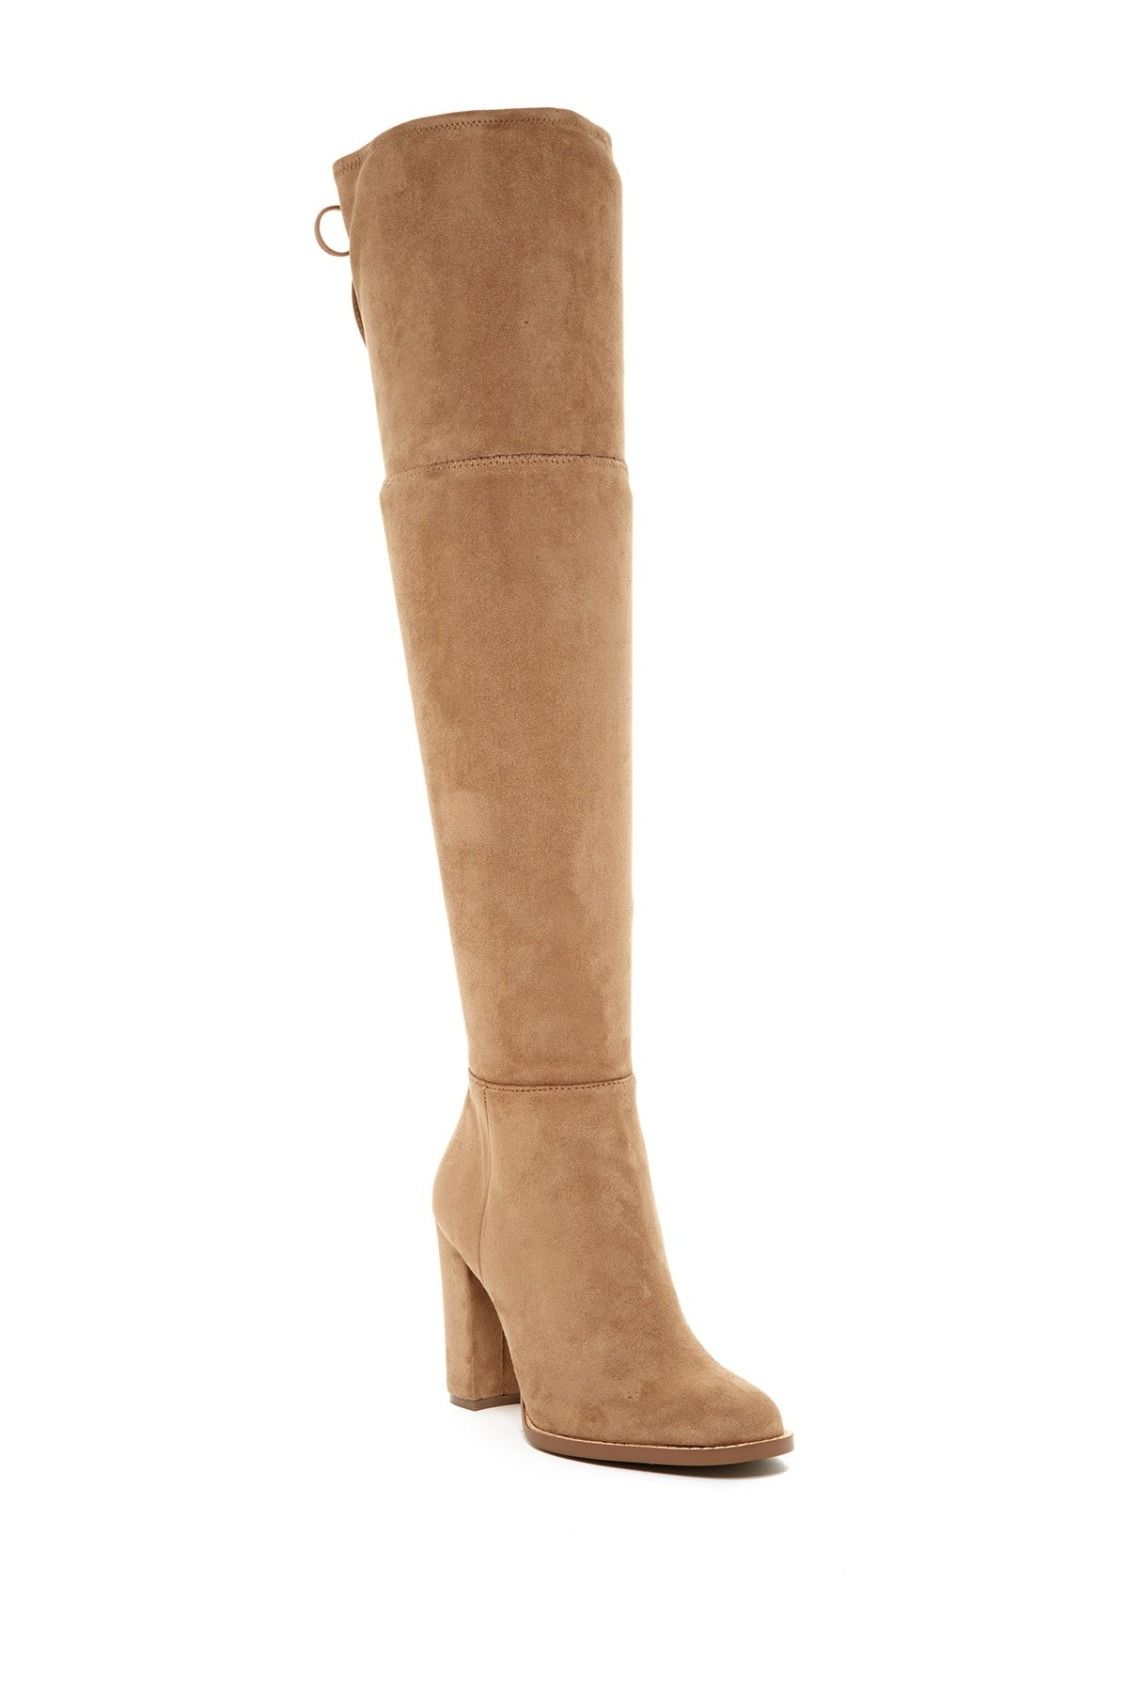 841bce10769 Gorgeous Khaki Vince Camuto Grady Over-The-Knee Boots